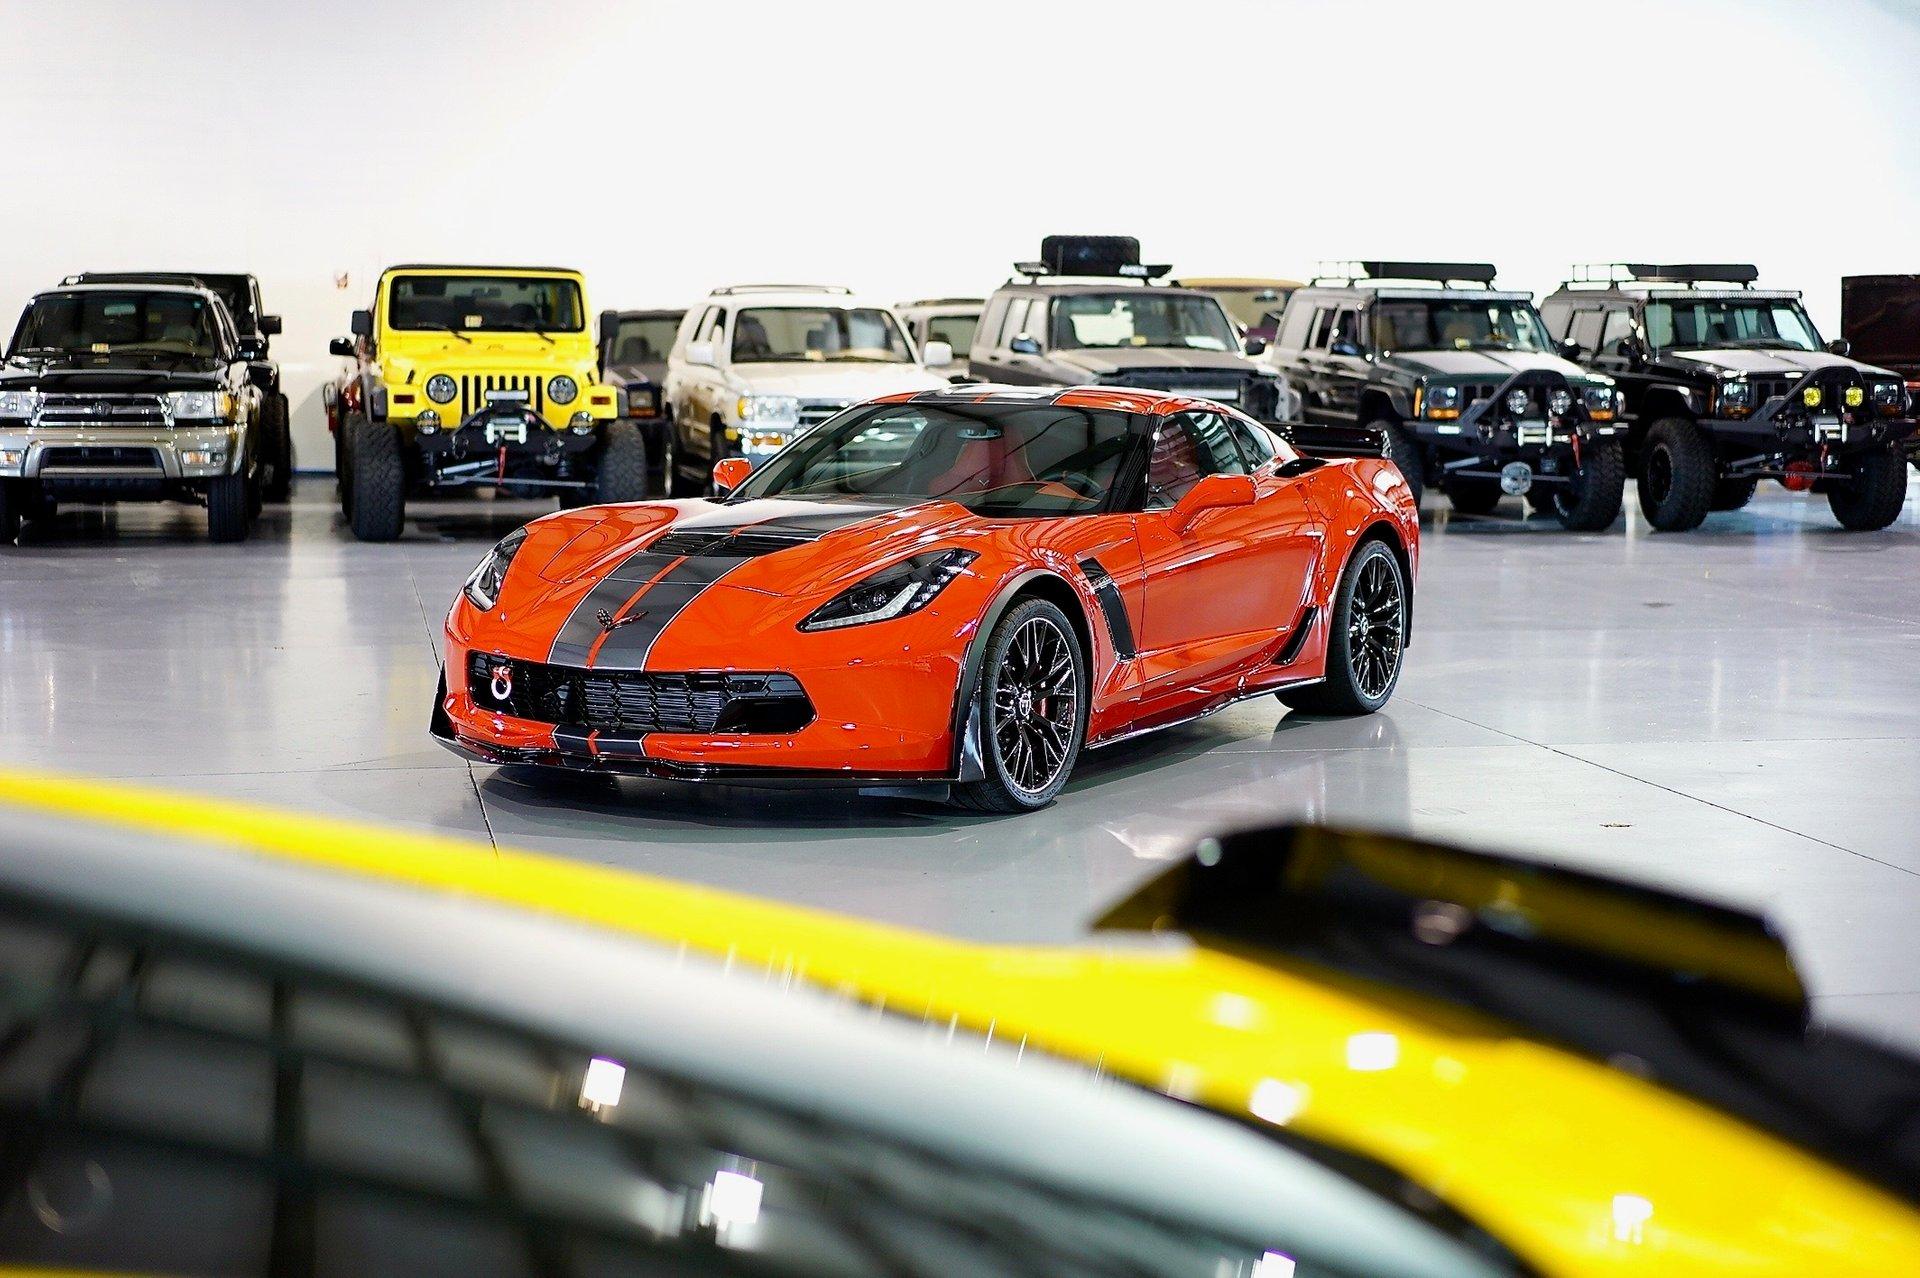 2016 chevrolet corvette 2dr z06 cpe w 2lz